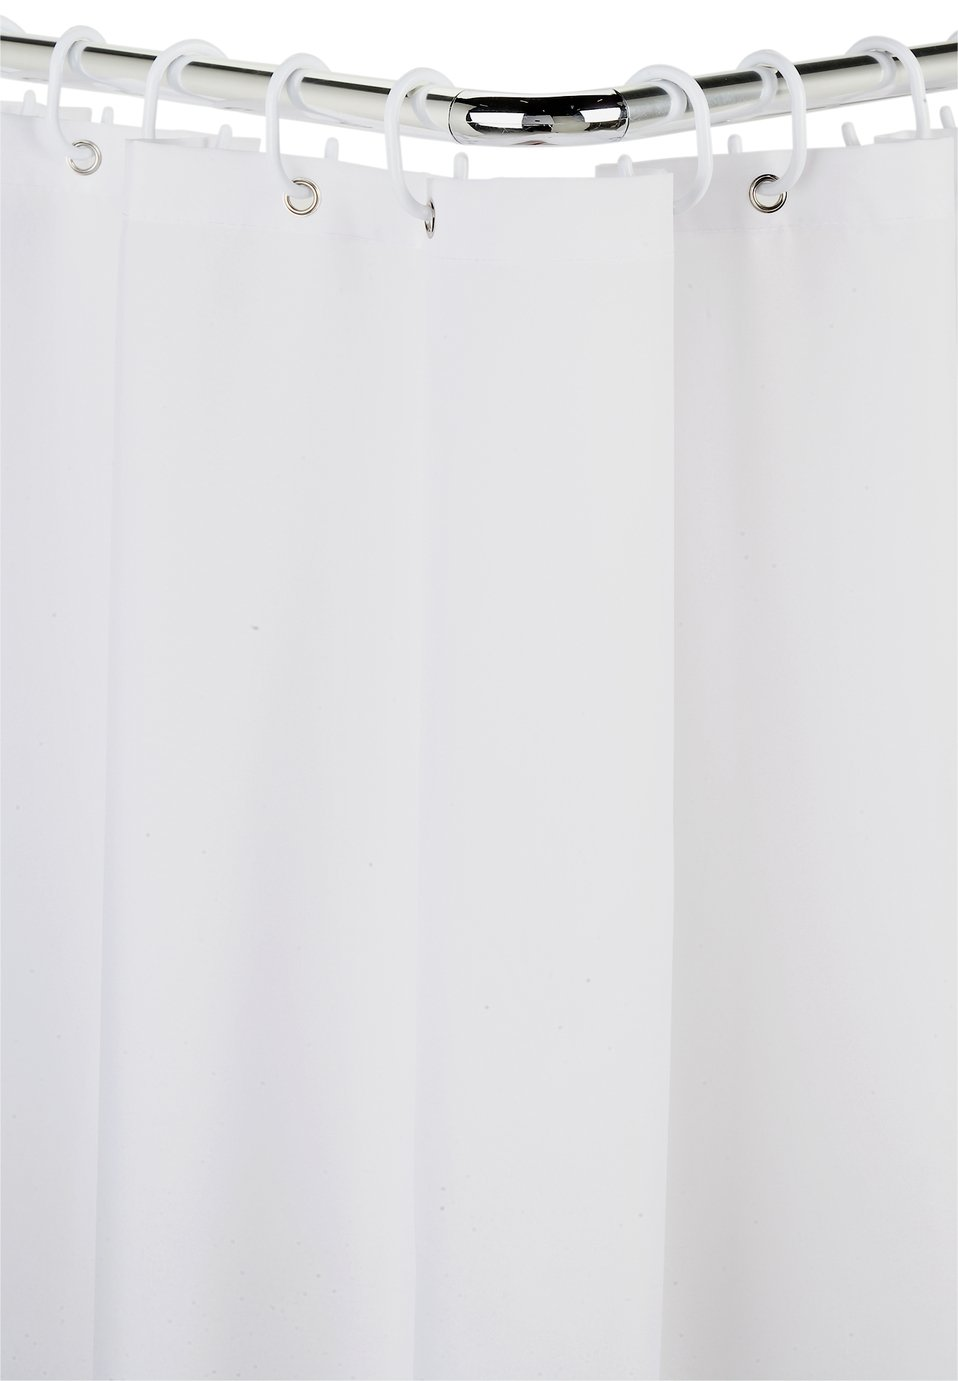 'Croydex - Modular Aluminium Shower Curtain & Rail Set - Chrome